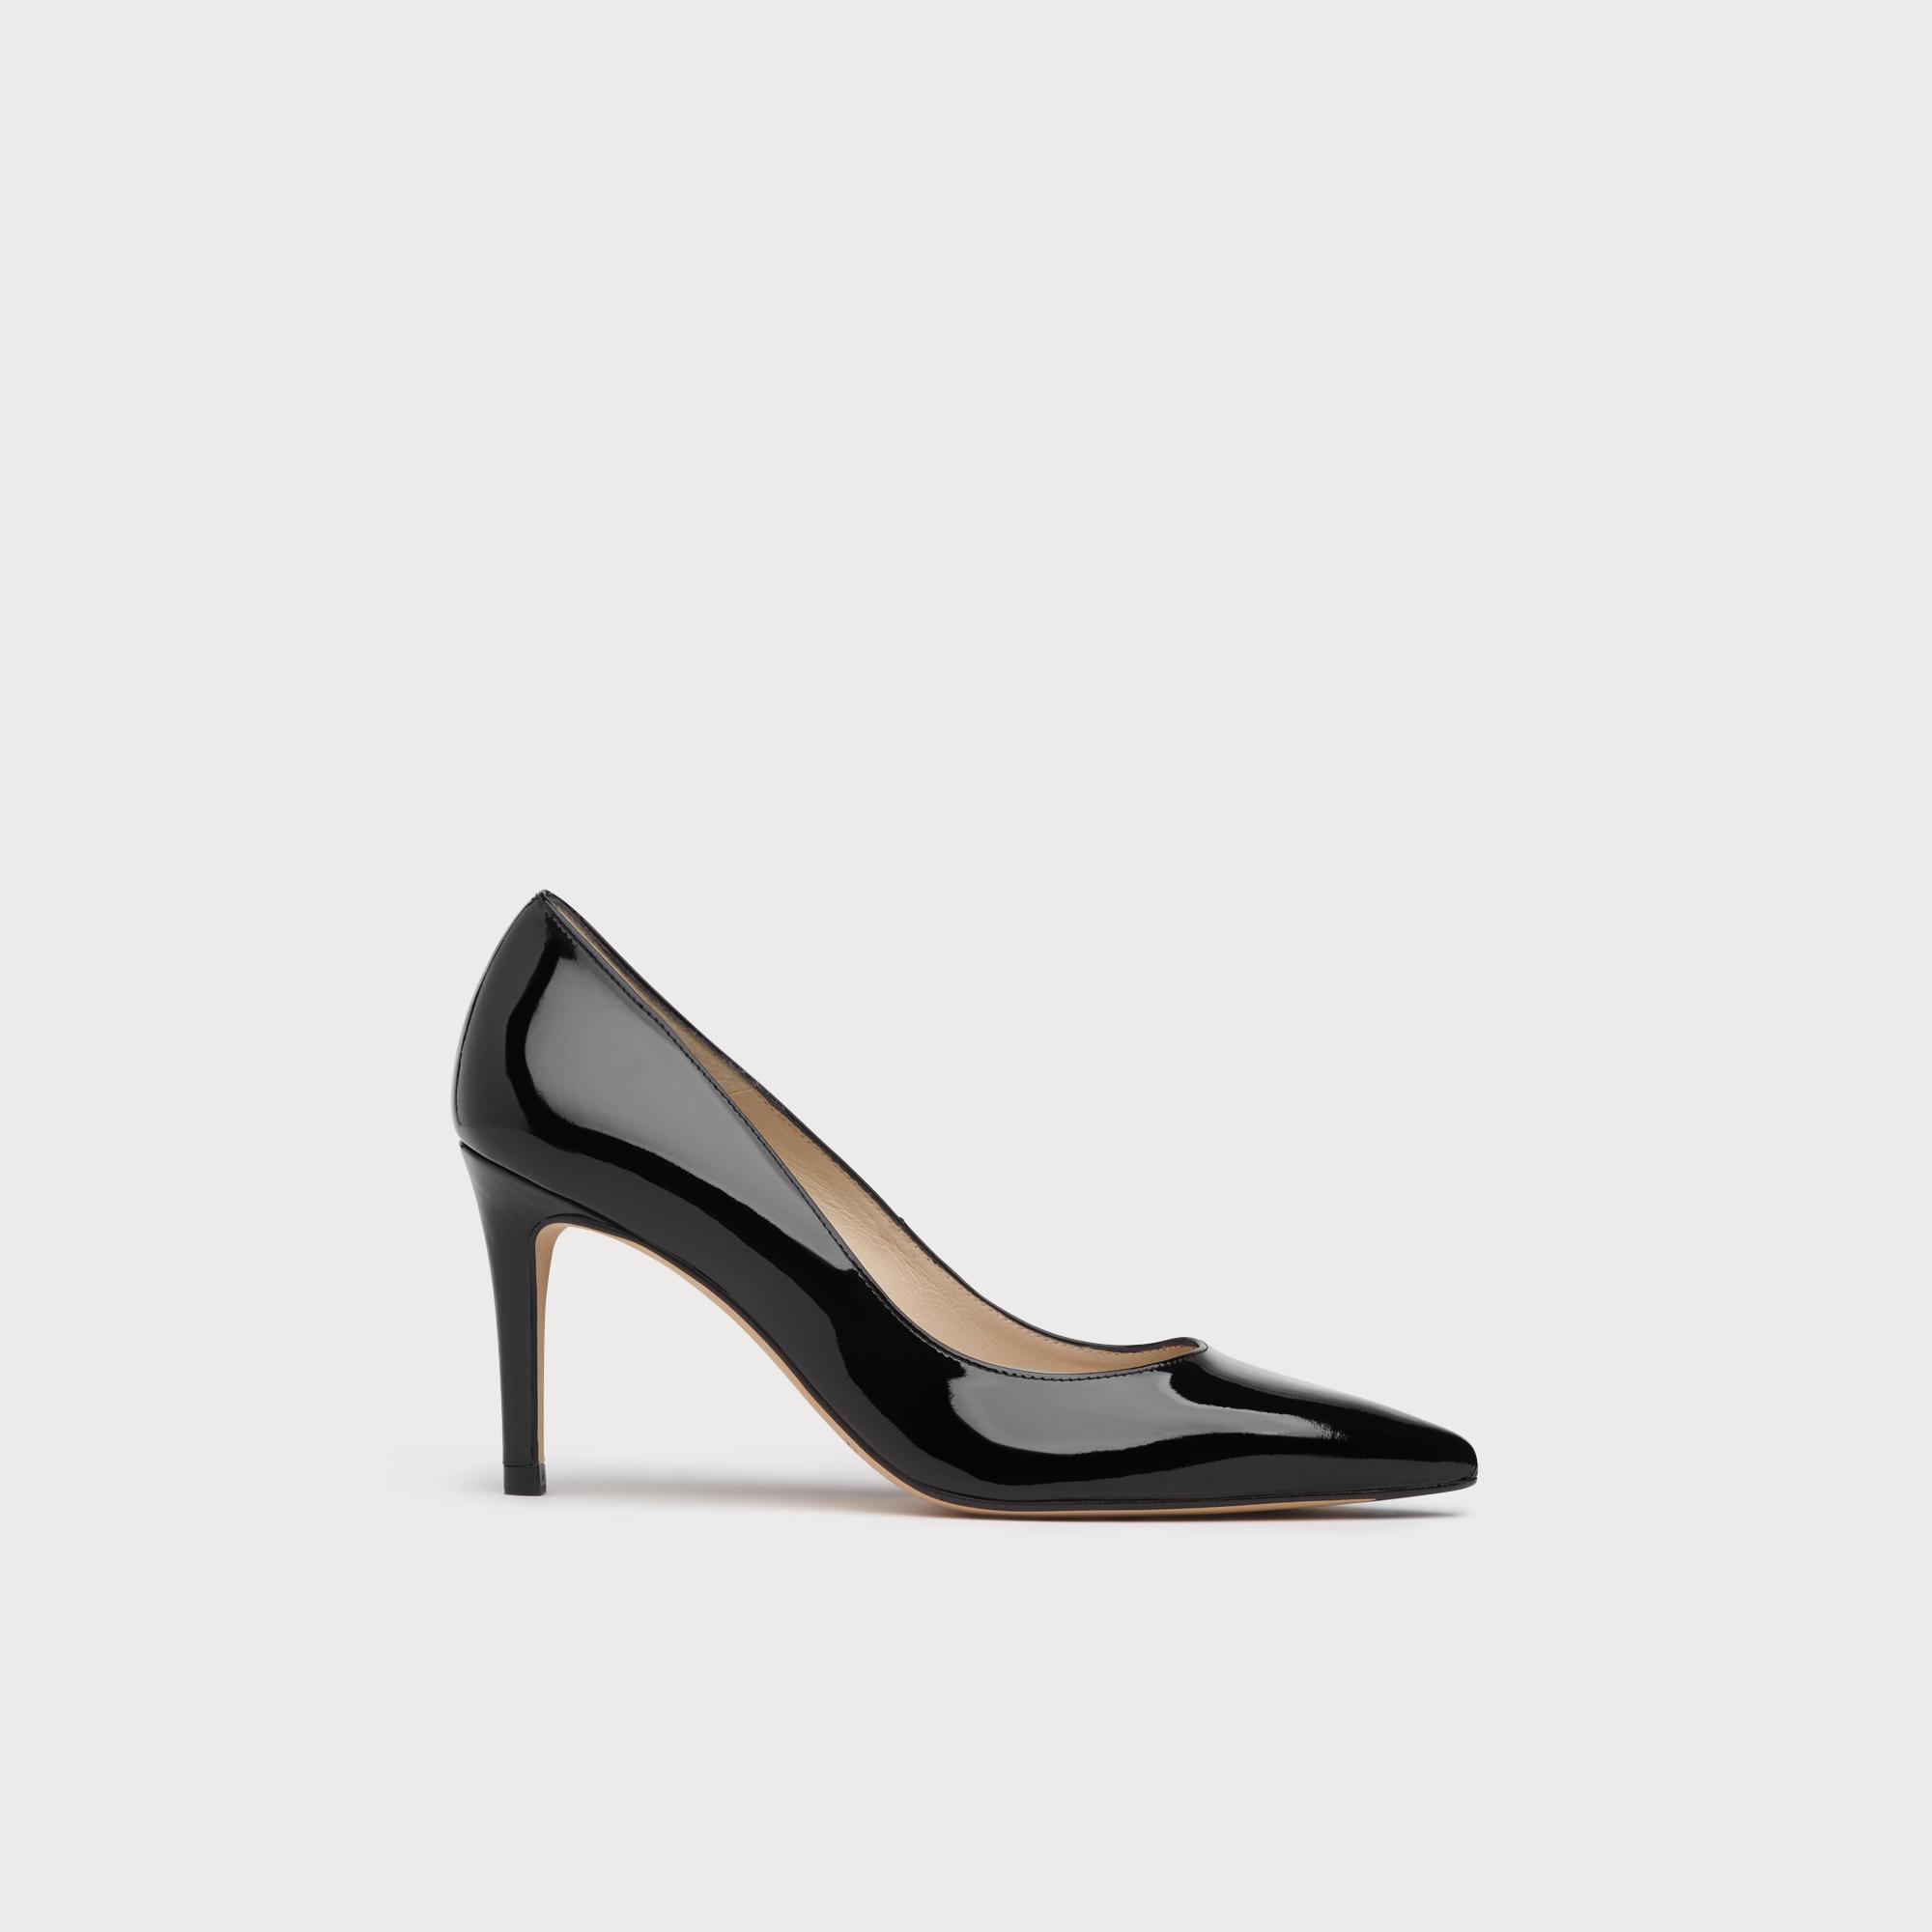 8c1282facb4 Florete Patent Leather Pointed Toe Court | Shoes | L.K.Bennett